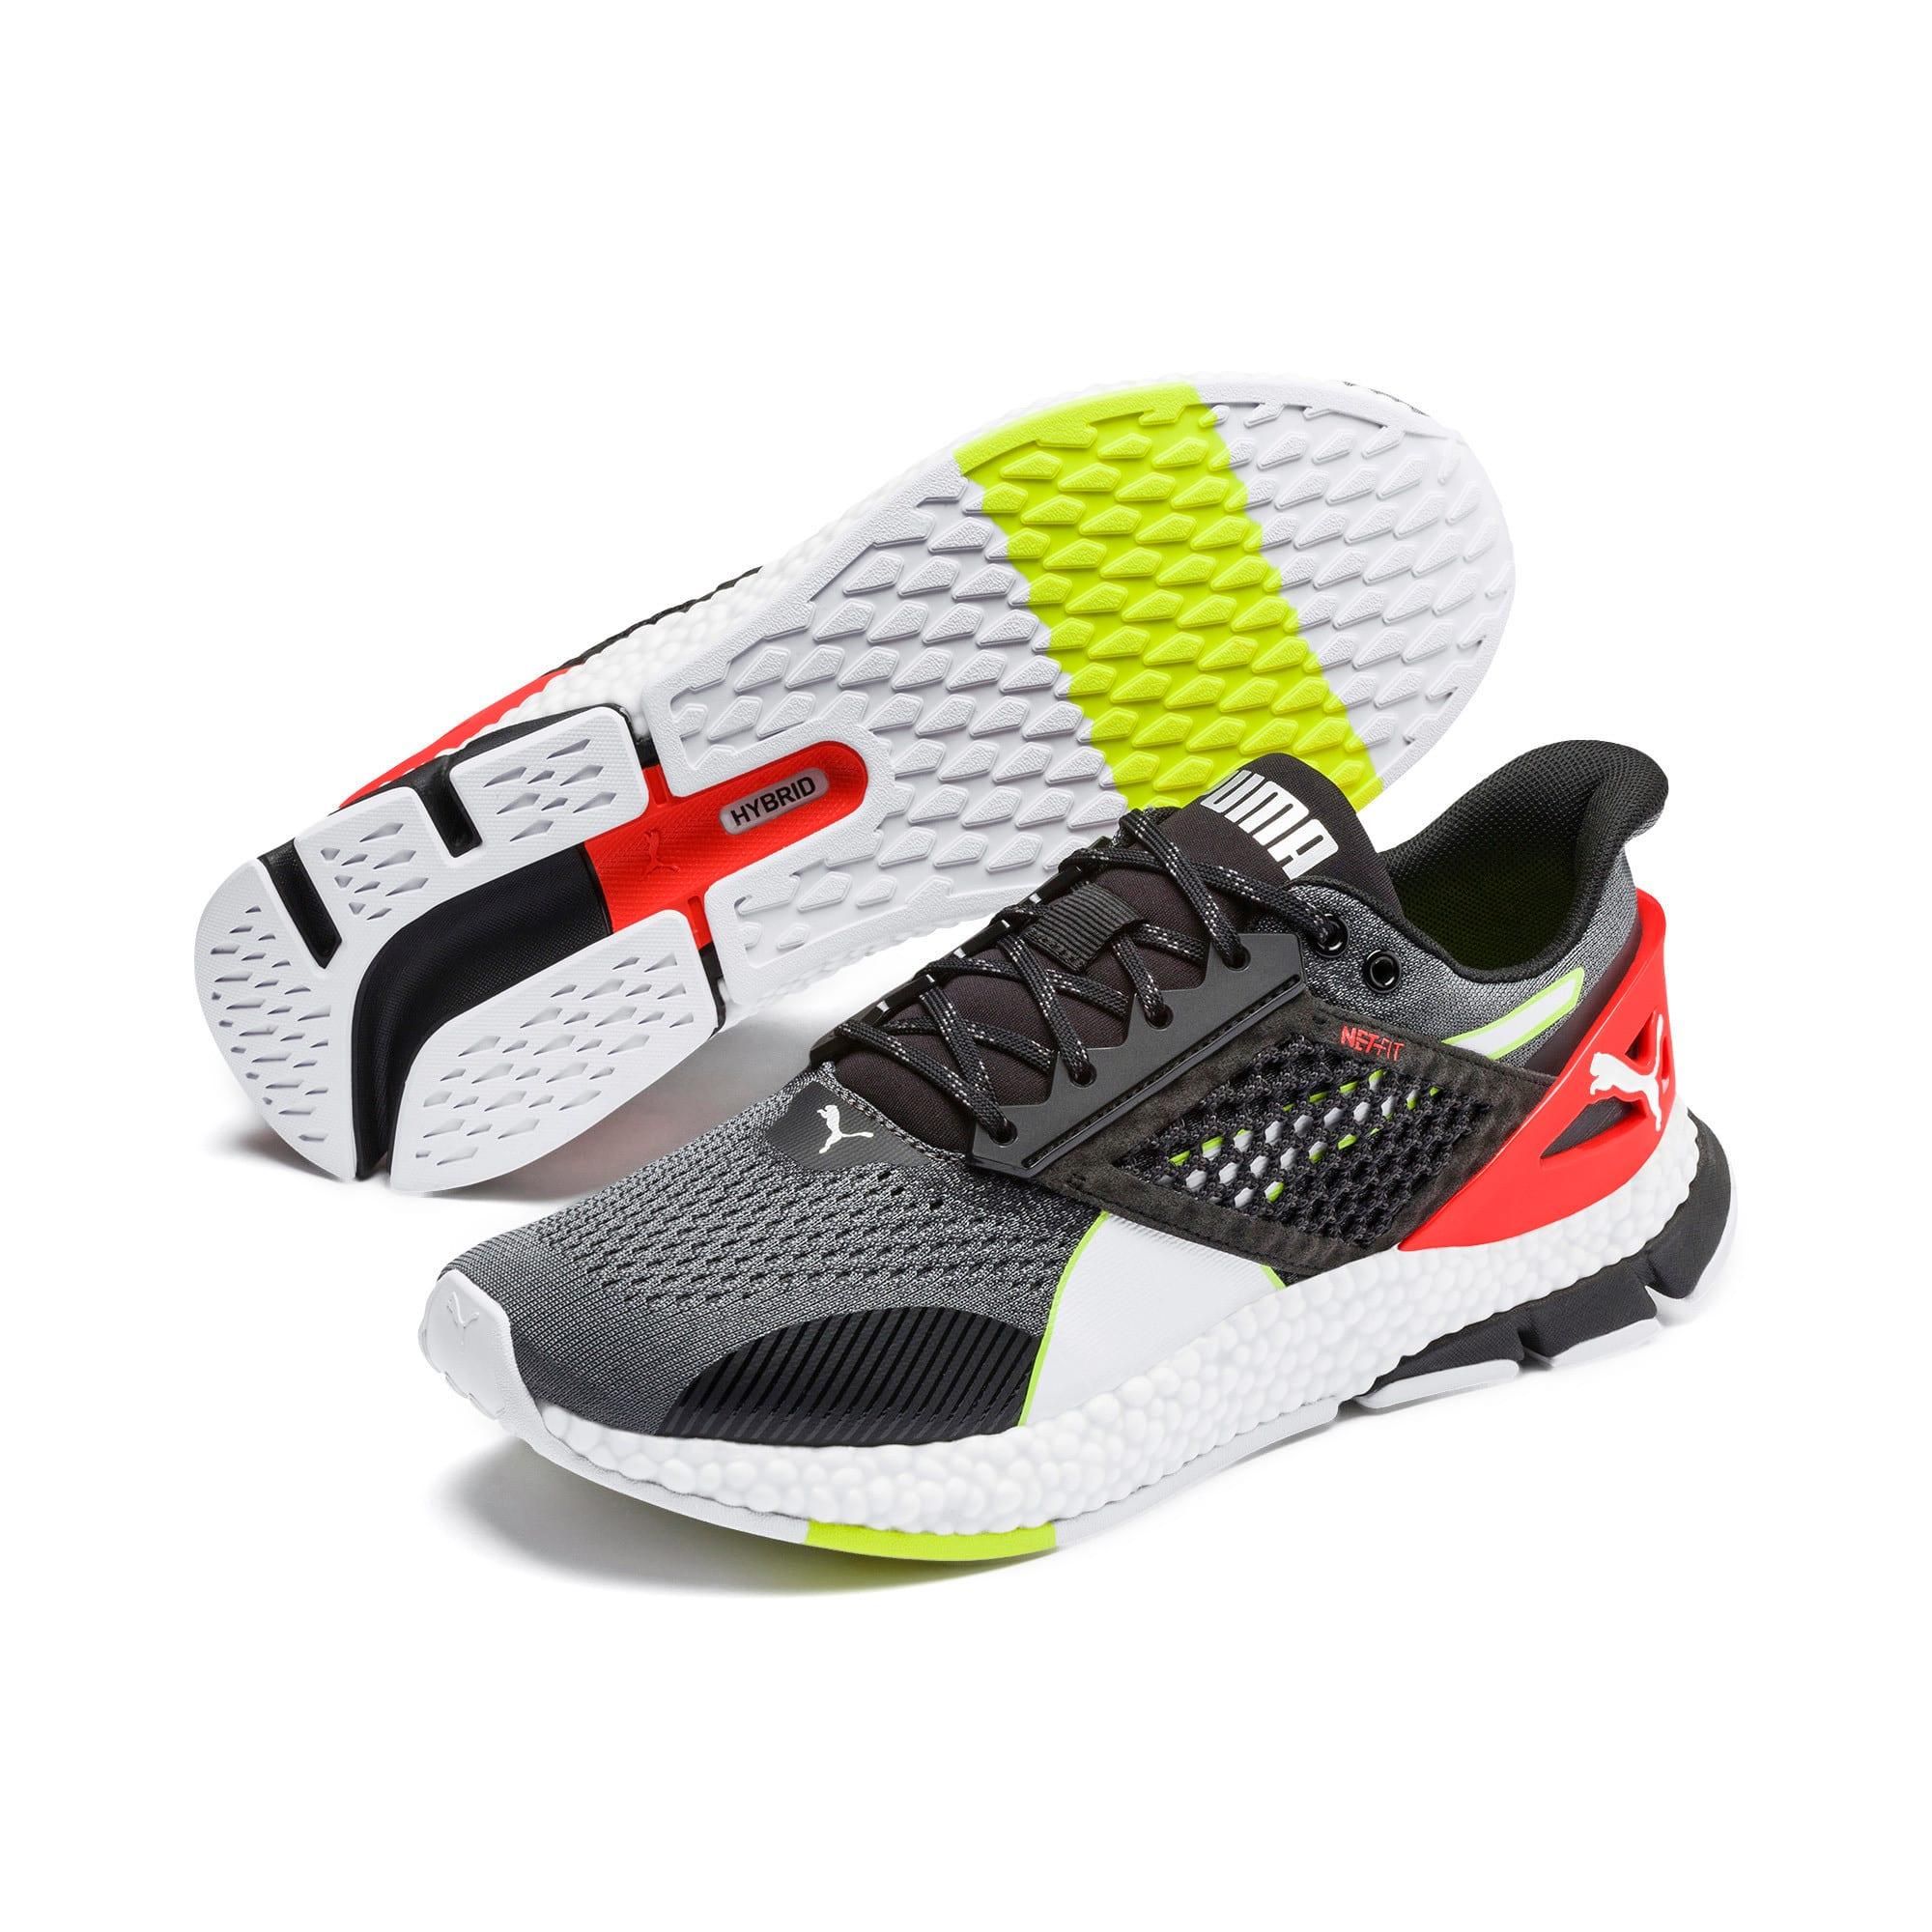 Thumbnail 3 of HYBRID NETFIT Astro Men's Running Shoes, CASTLEROCK-Puma Blck-Ngy Red, medium